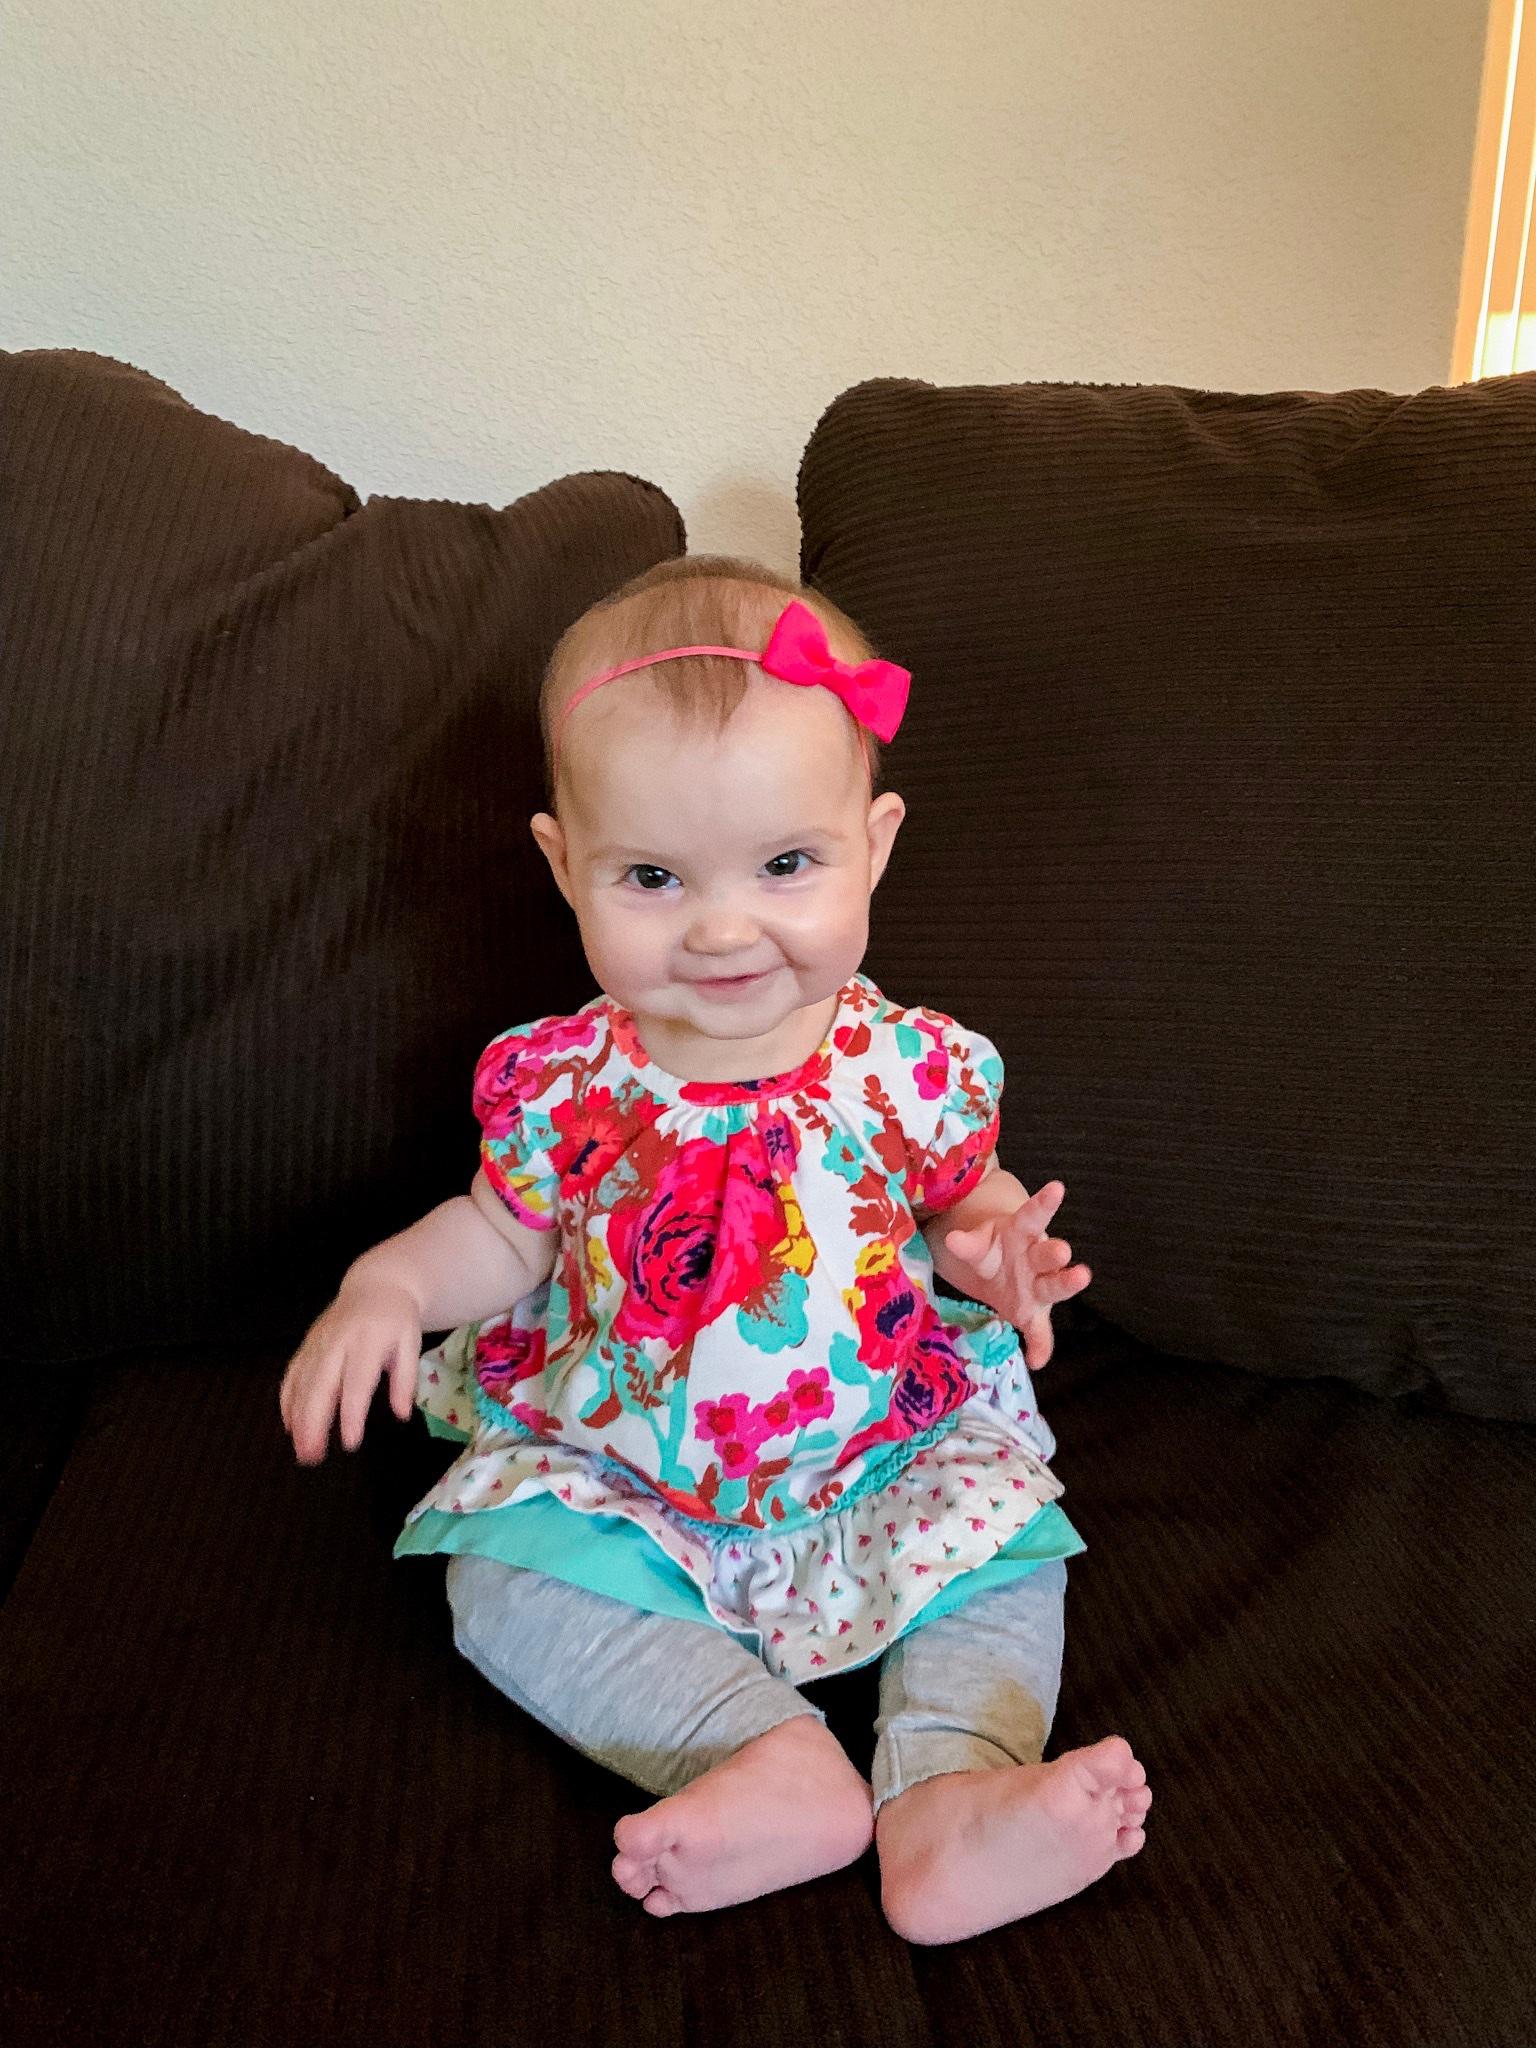 6 Months of Iyla Noelle